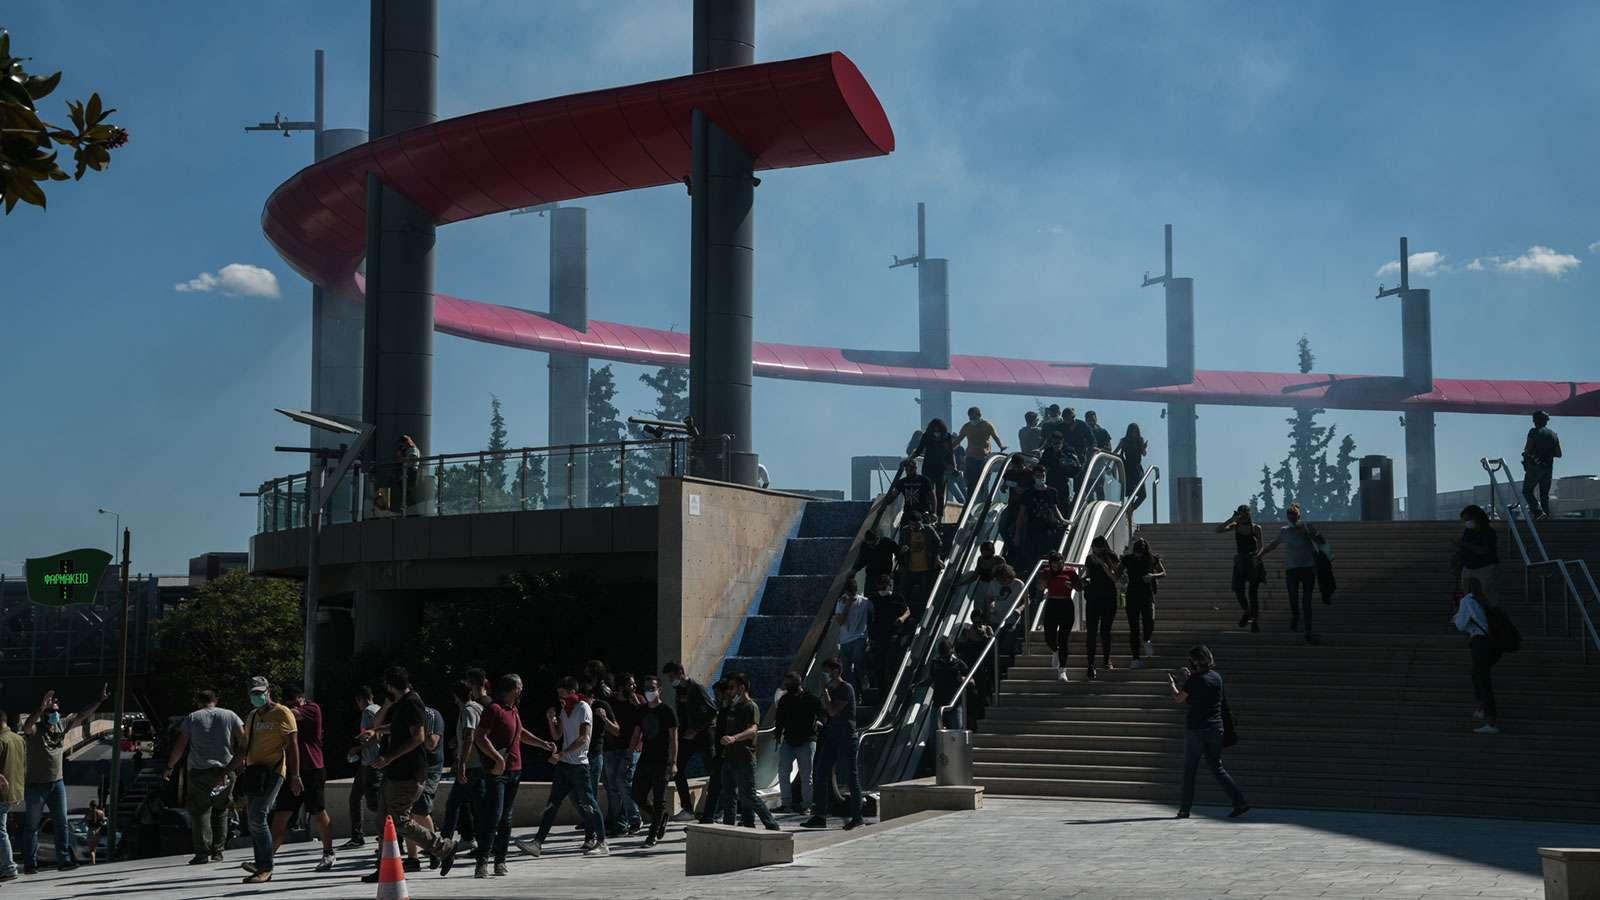 mat Η κυβέρνηση έπνιξε με χημικά τη διαδήλωση των μαθητών